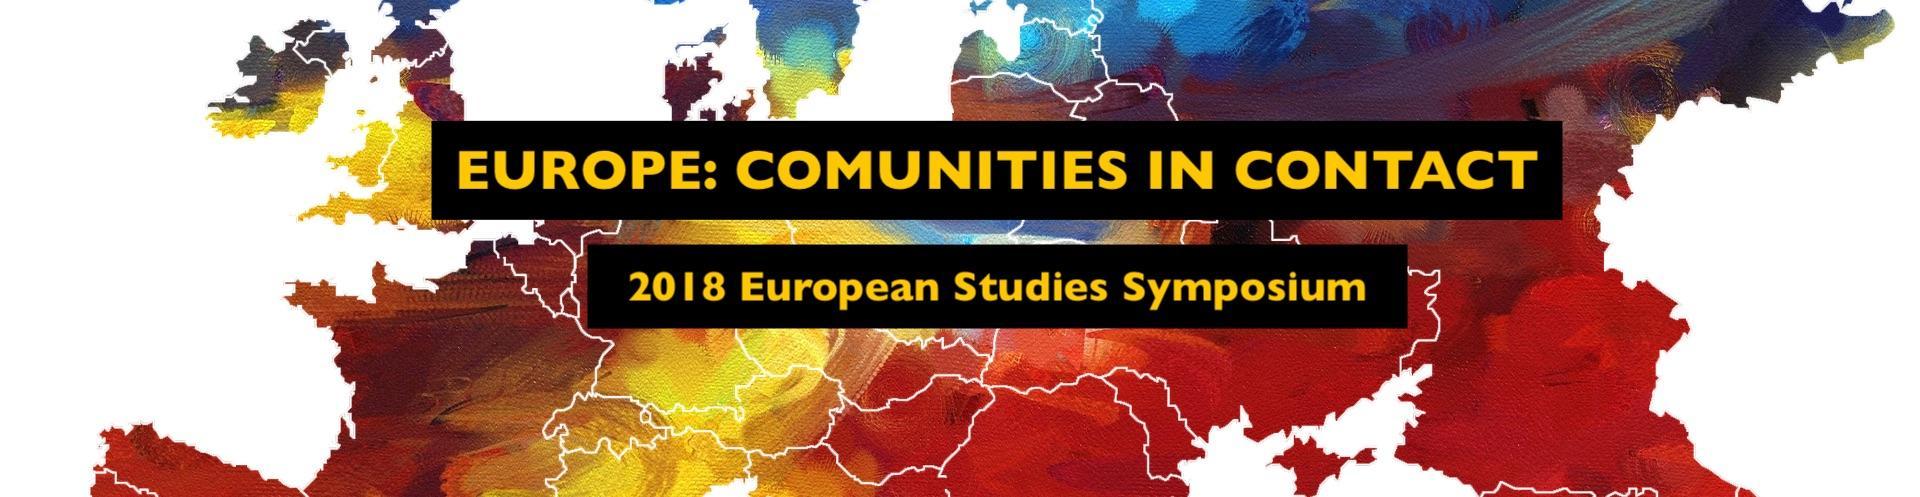 Where can European Studies take you?